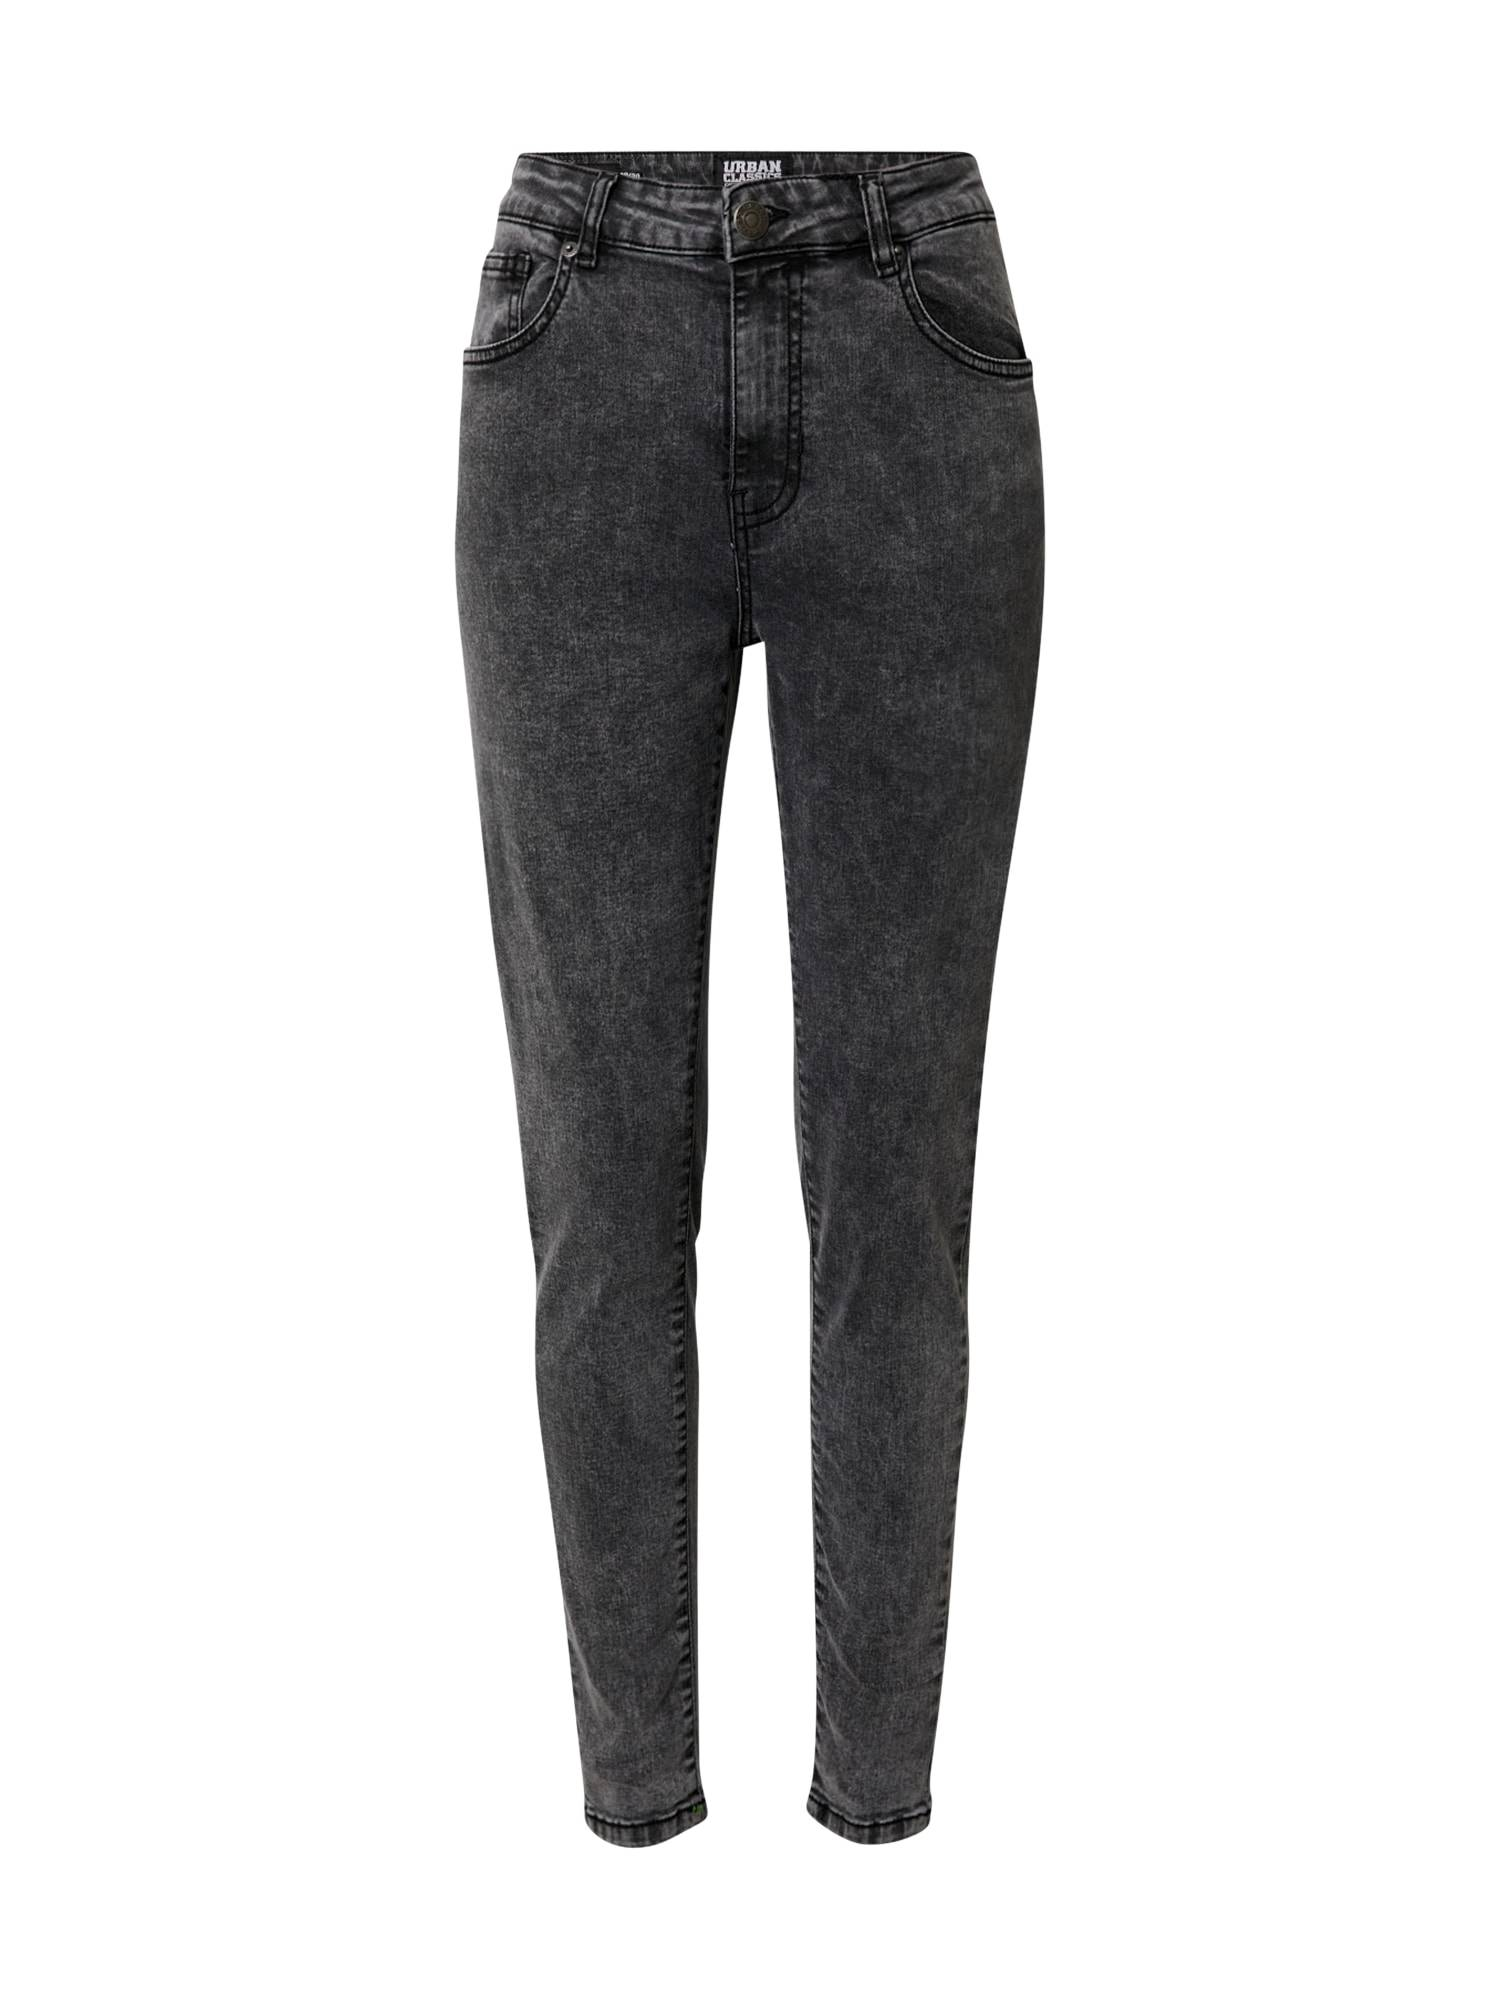 Urban Classics Jean  - Noir - Taille: 27 - female